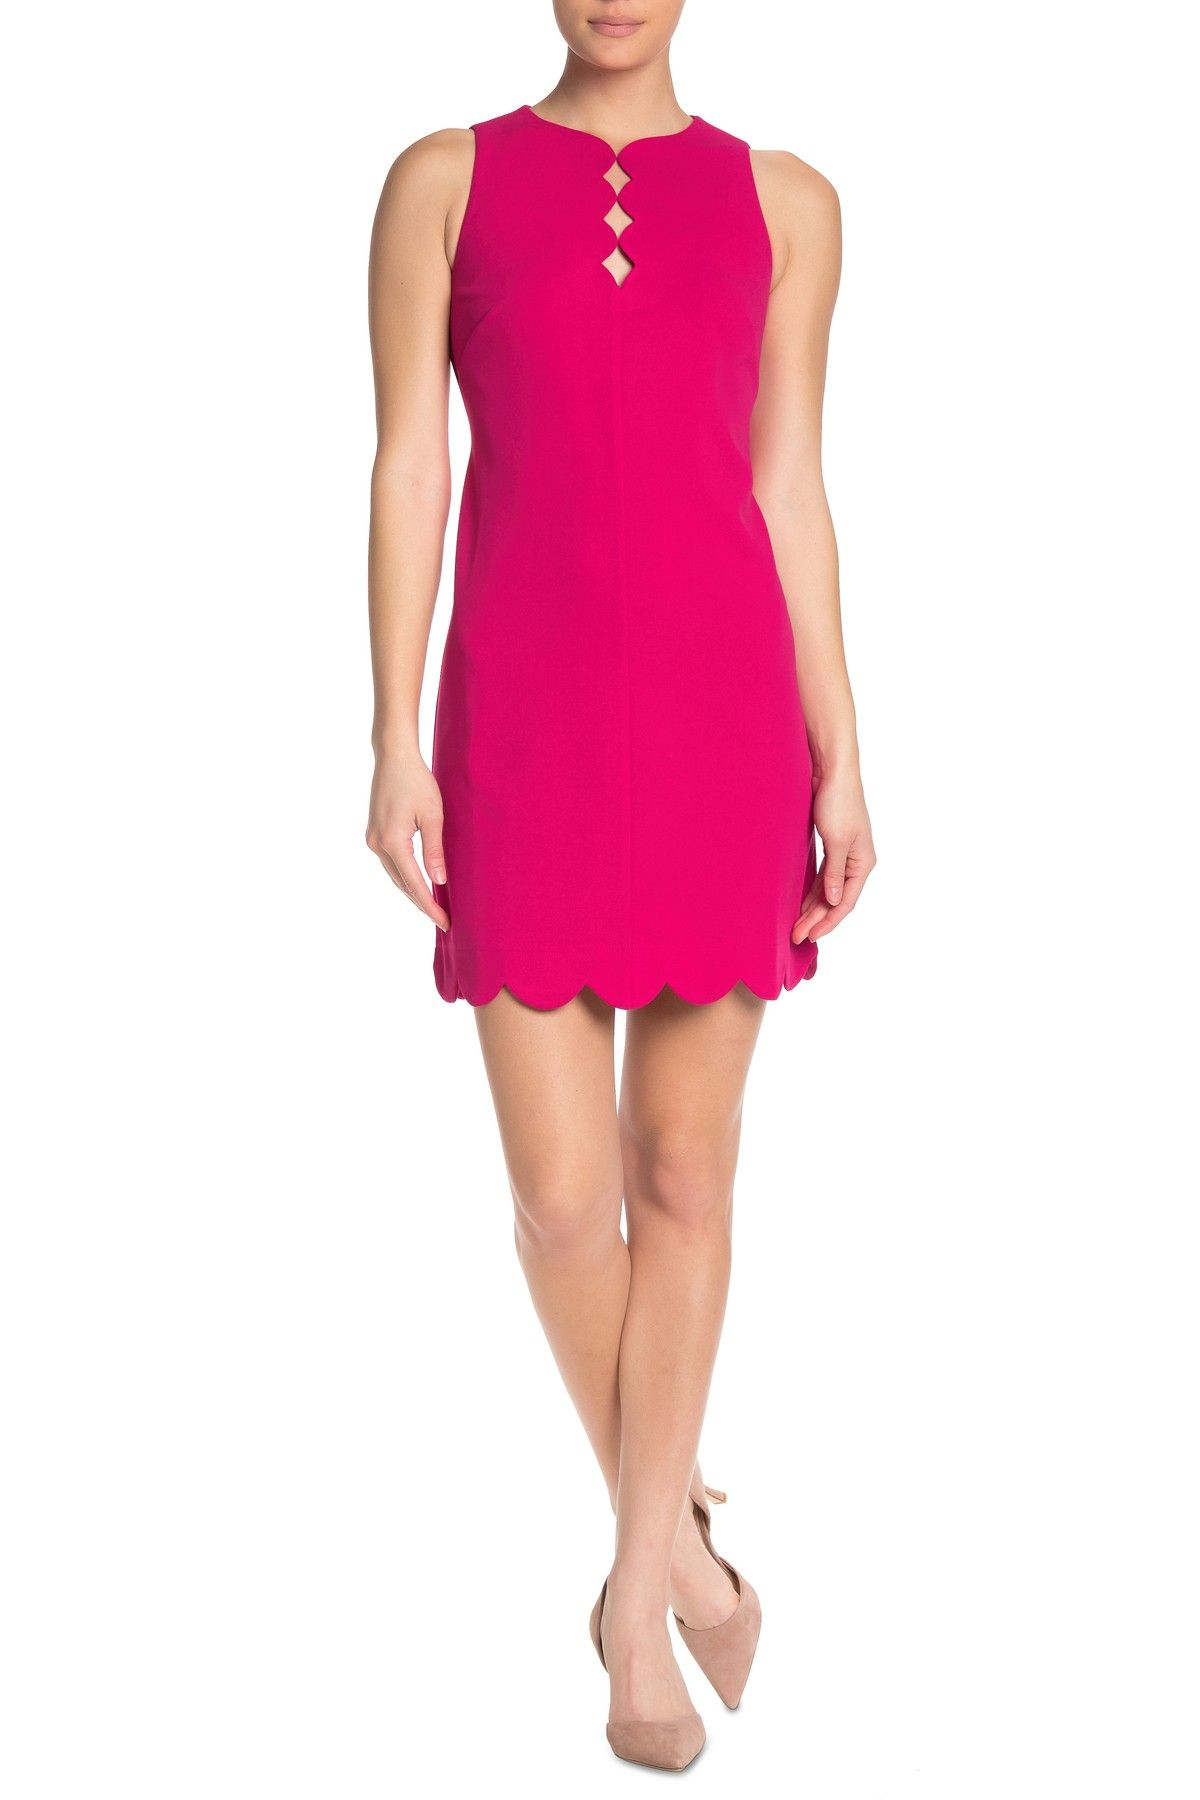 Vince Camuto Scalloped Cutout Hem Sleeveless Dress Nordstrom Rack Professional Dresses Summer Fashion Outfits Dresses [ 1800 x 1200 Pixel ]